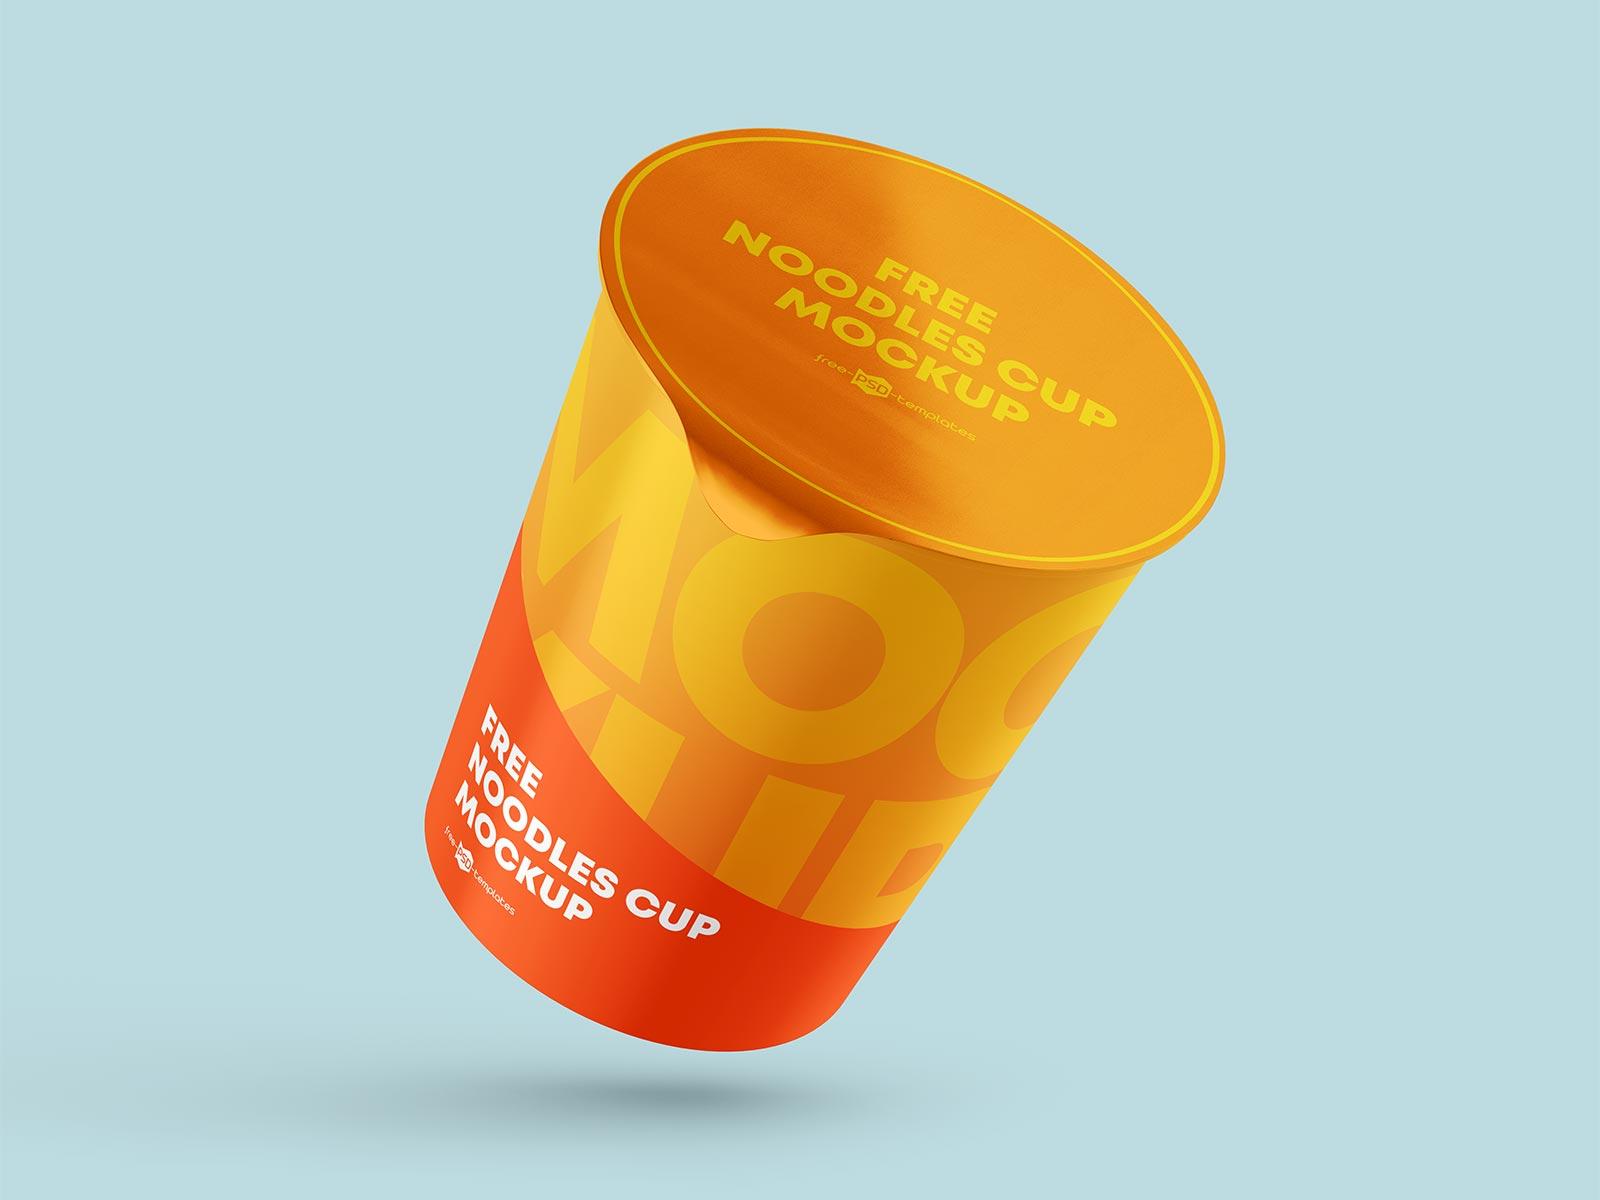 Free-Noodles-Yogurt-Peel-Off-Lid-Cup-Mockup-PSD-Set